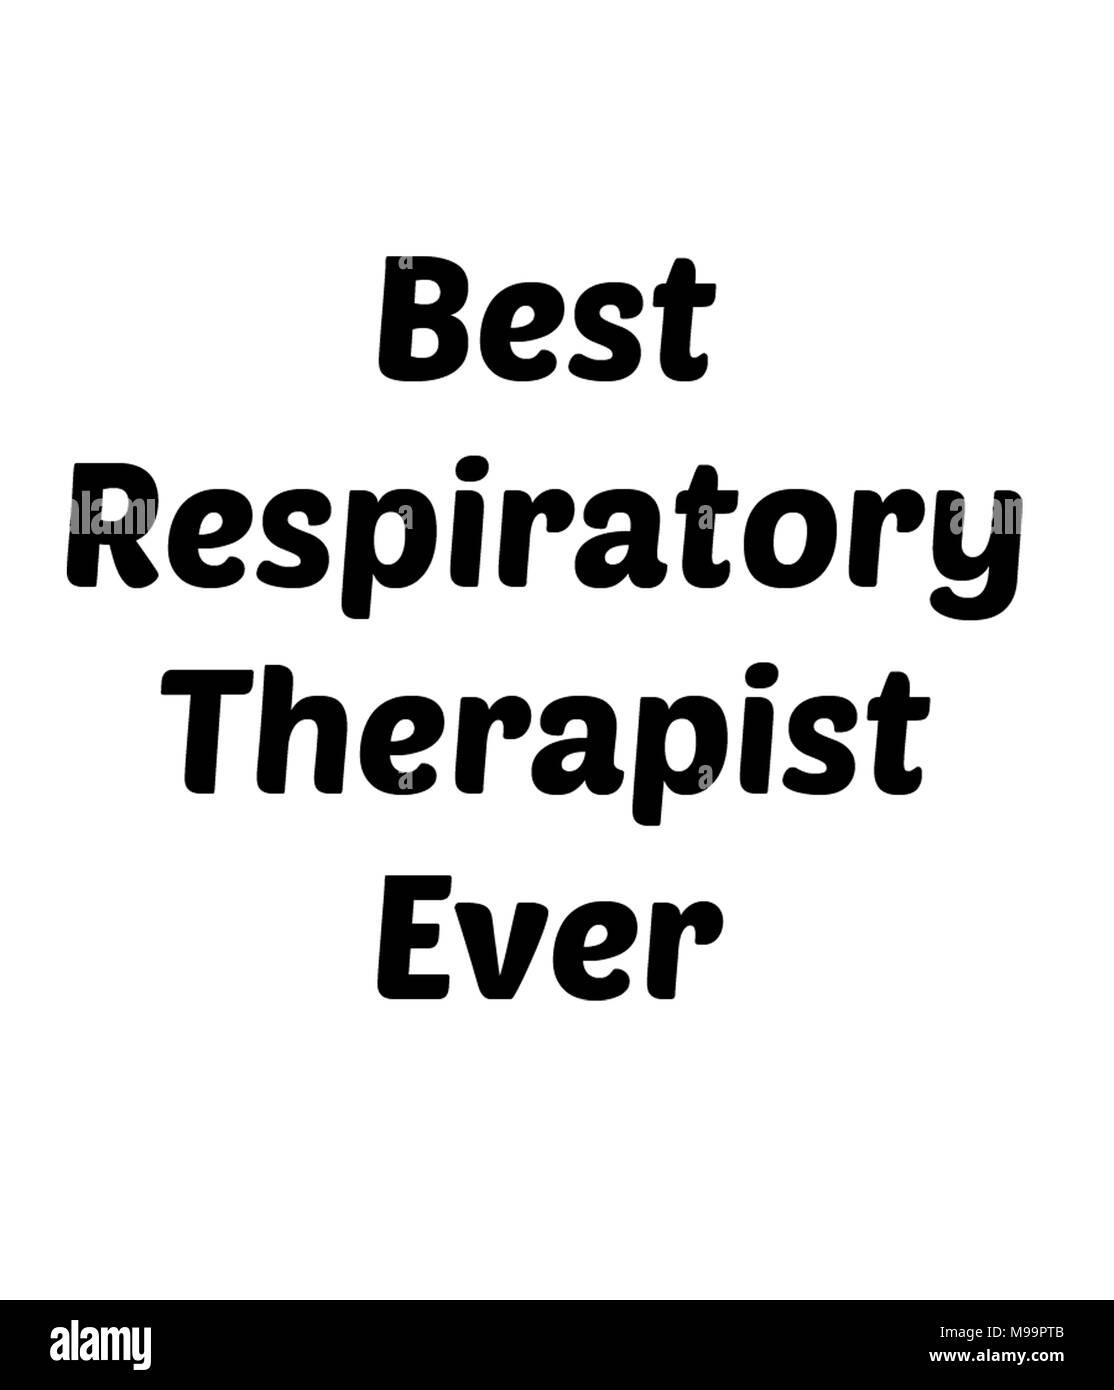 Best Respiratory Therapist Ever - Stock Image